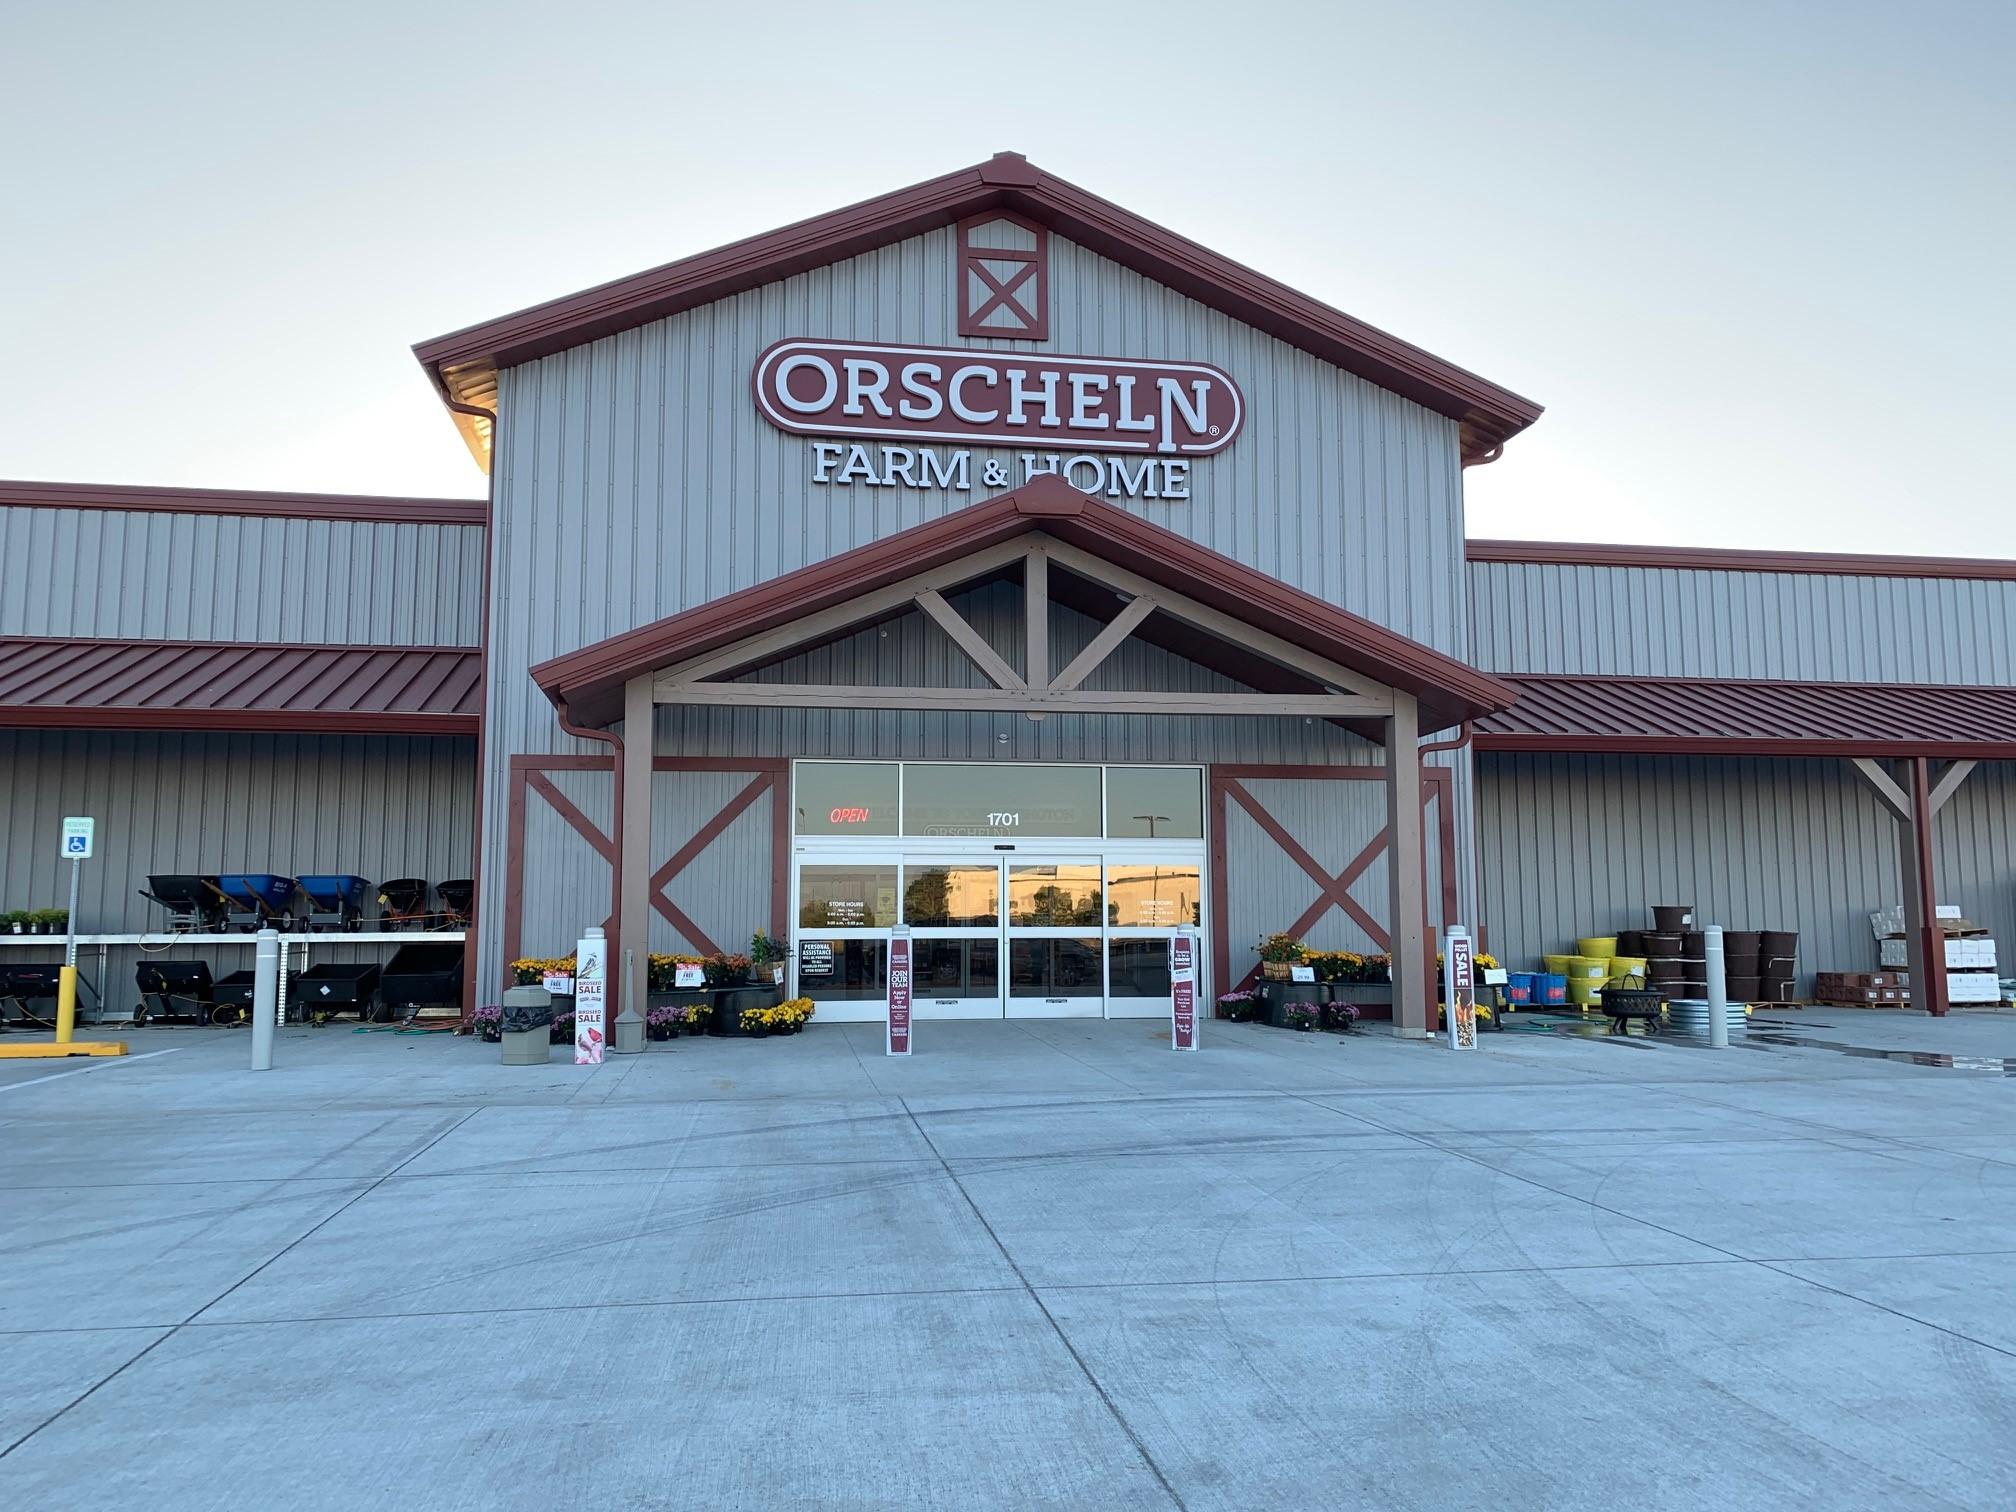 Front view of Orscheln Farm & Home Store in Seward, Nebraska 68434-2707